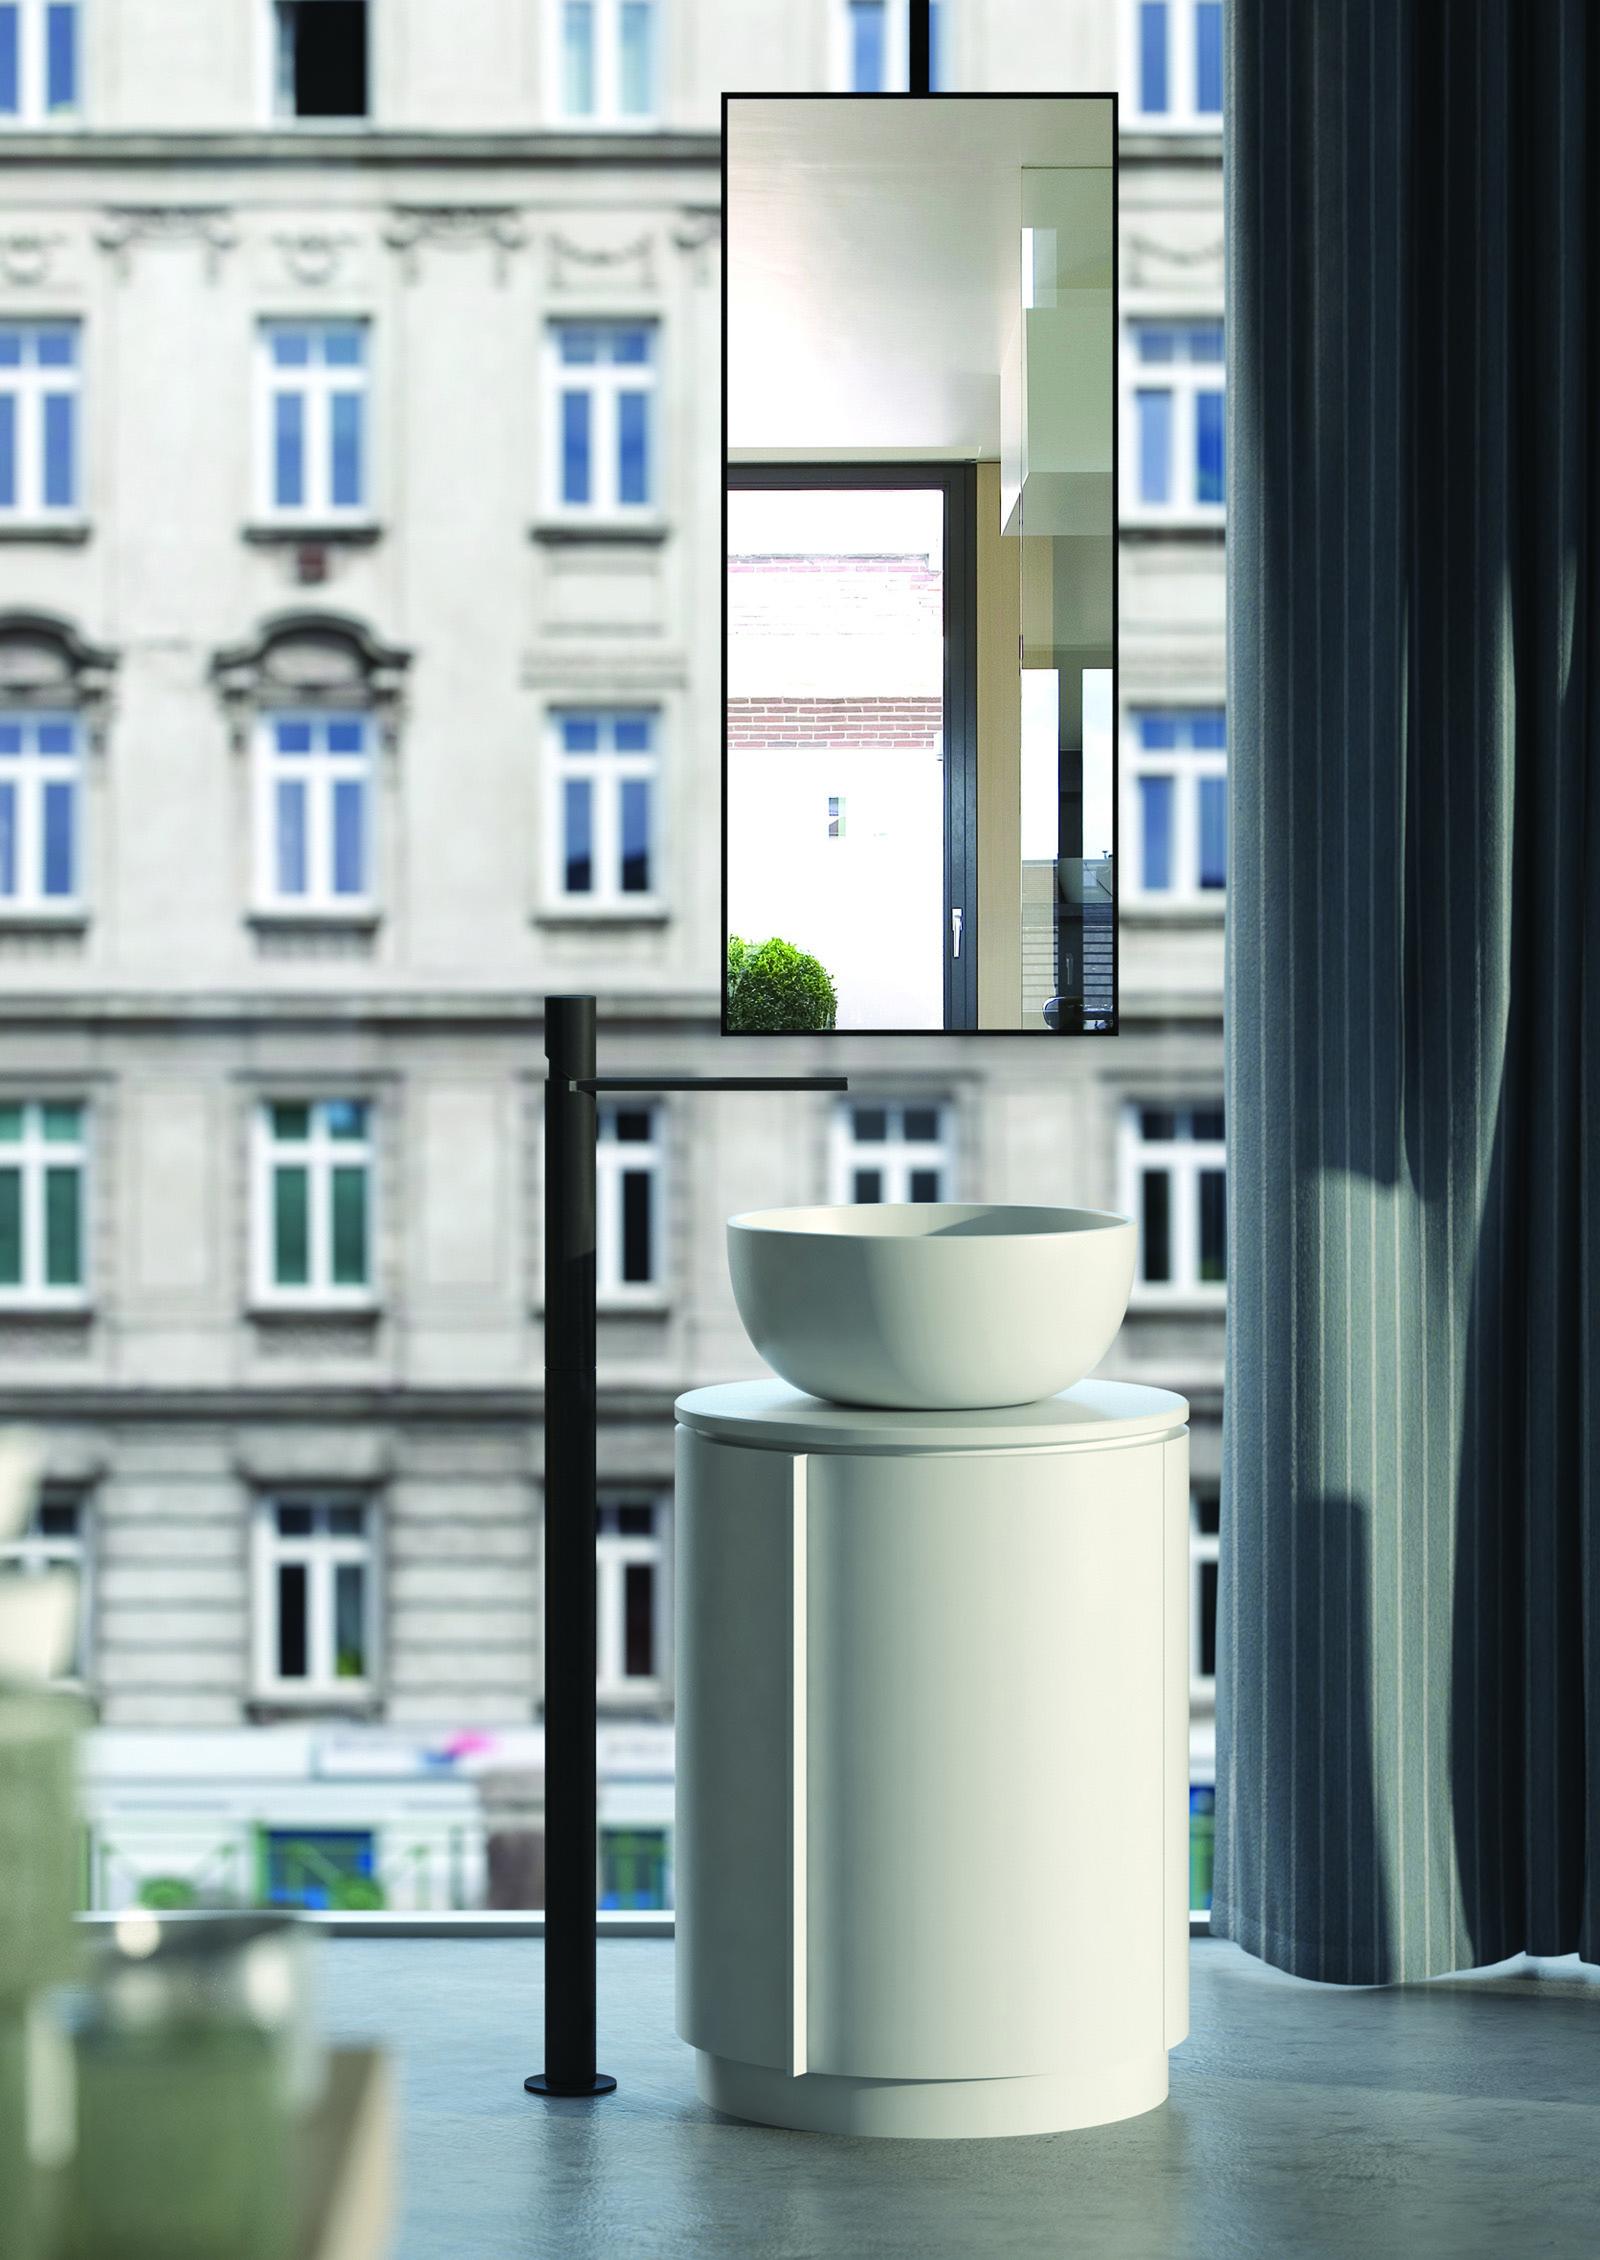 cielo-al-the-hotel-show-dubai-con-daydream-the-italian-hospitality-03